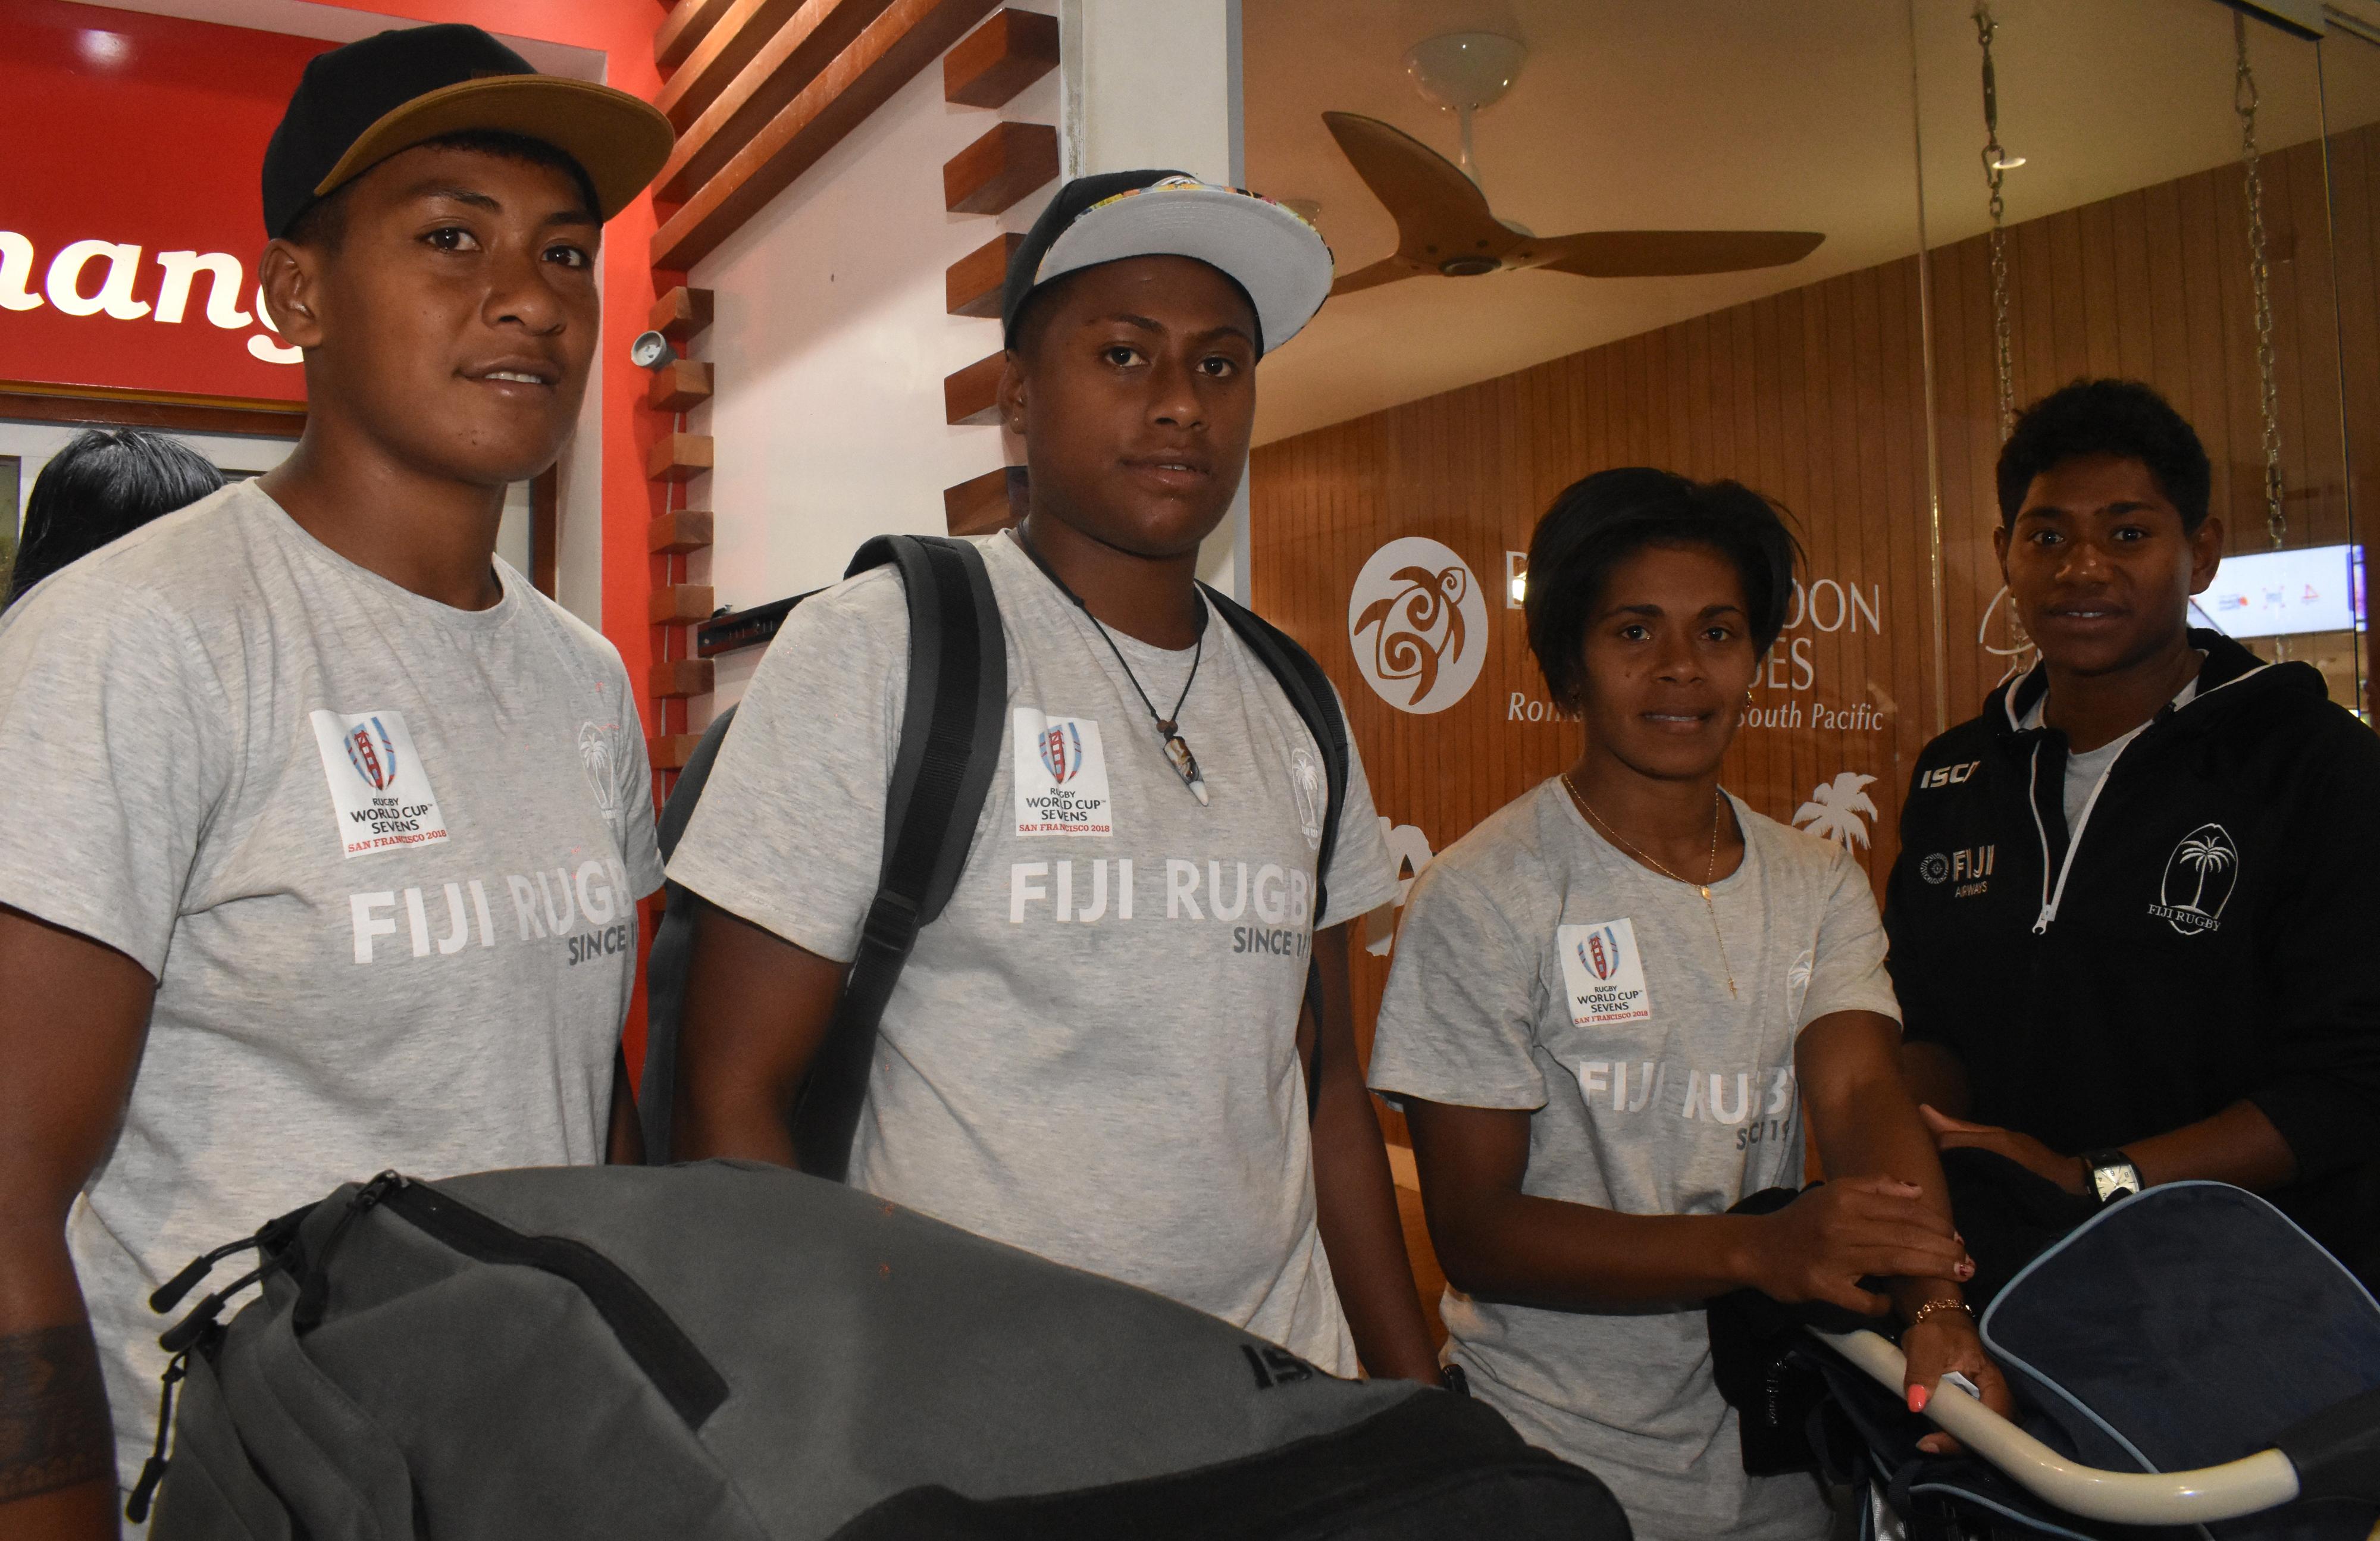 Fiji Airways Fijiana 7s reps  Merewai Cumu, captain Ana Maria Roqica and Ana Maria Neimasi at the Nadi International Airport on July 25, 2018 Photo : Waisea Nasokia